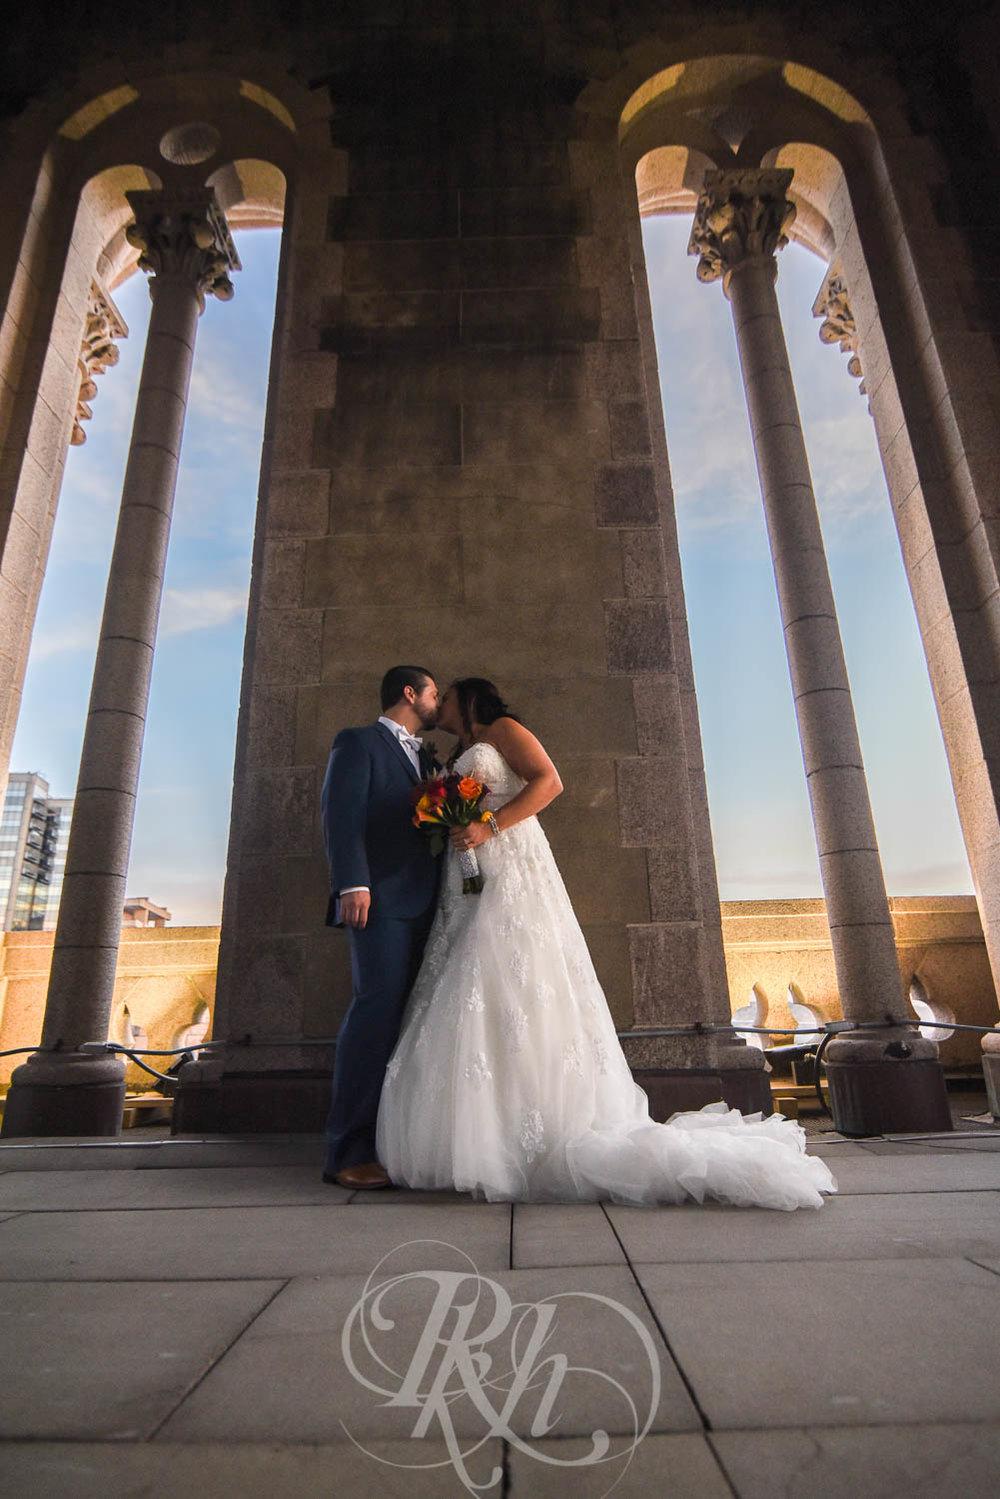 Elizabeth & David - Minnesota Wedding Photography - Landmark Center - RKH Images - Blog  (38 of 52).jpg